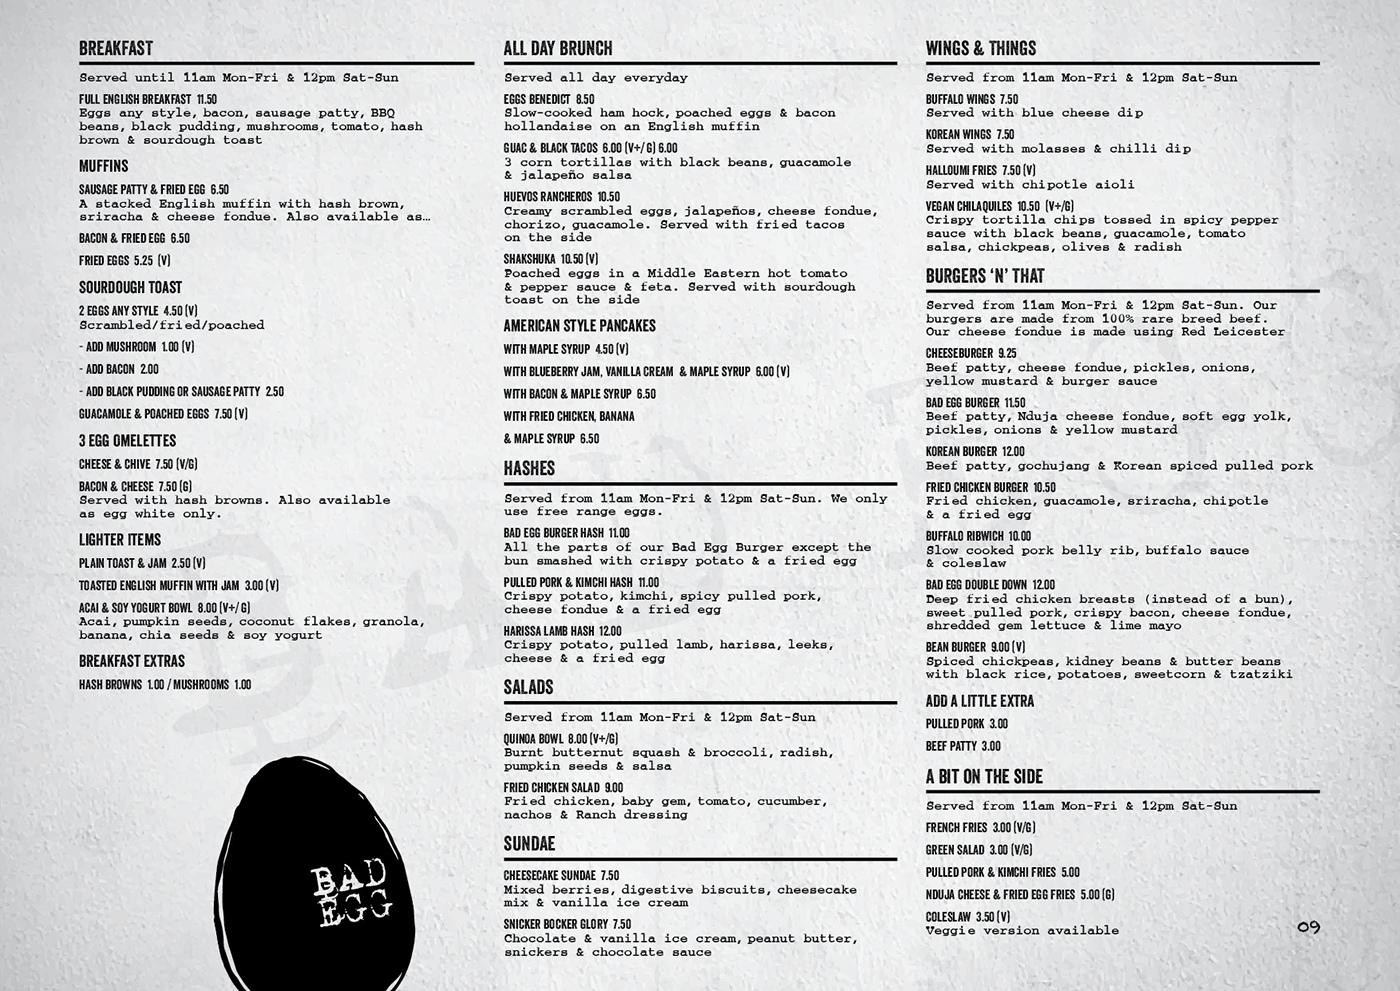 Restaurant_brochure_design_by_Desigbite_7